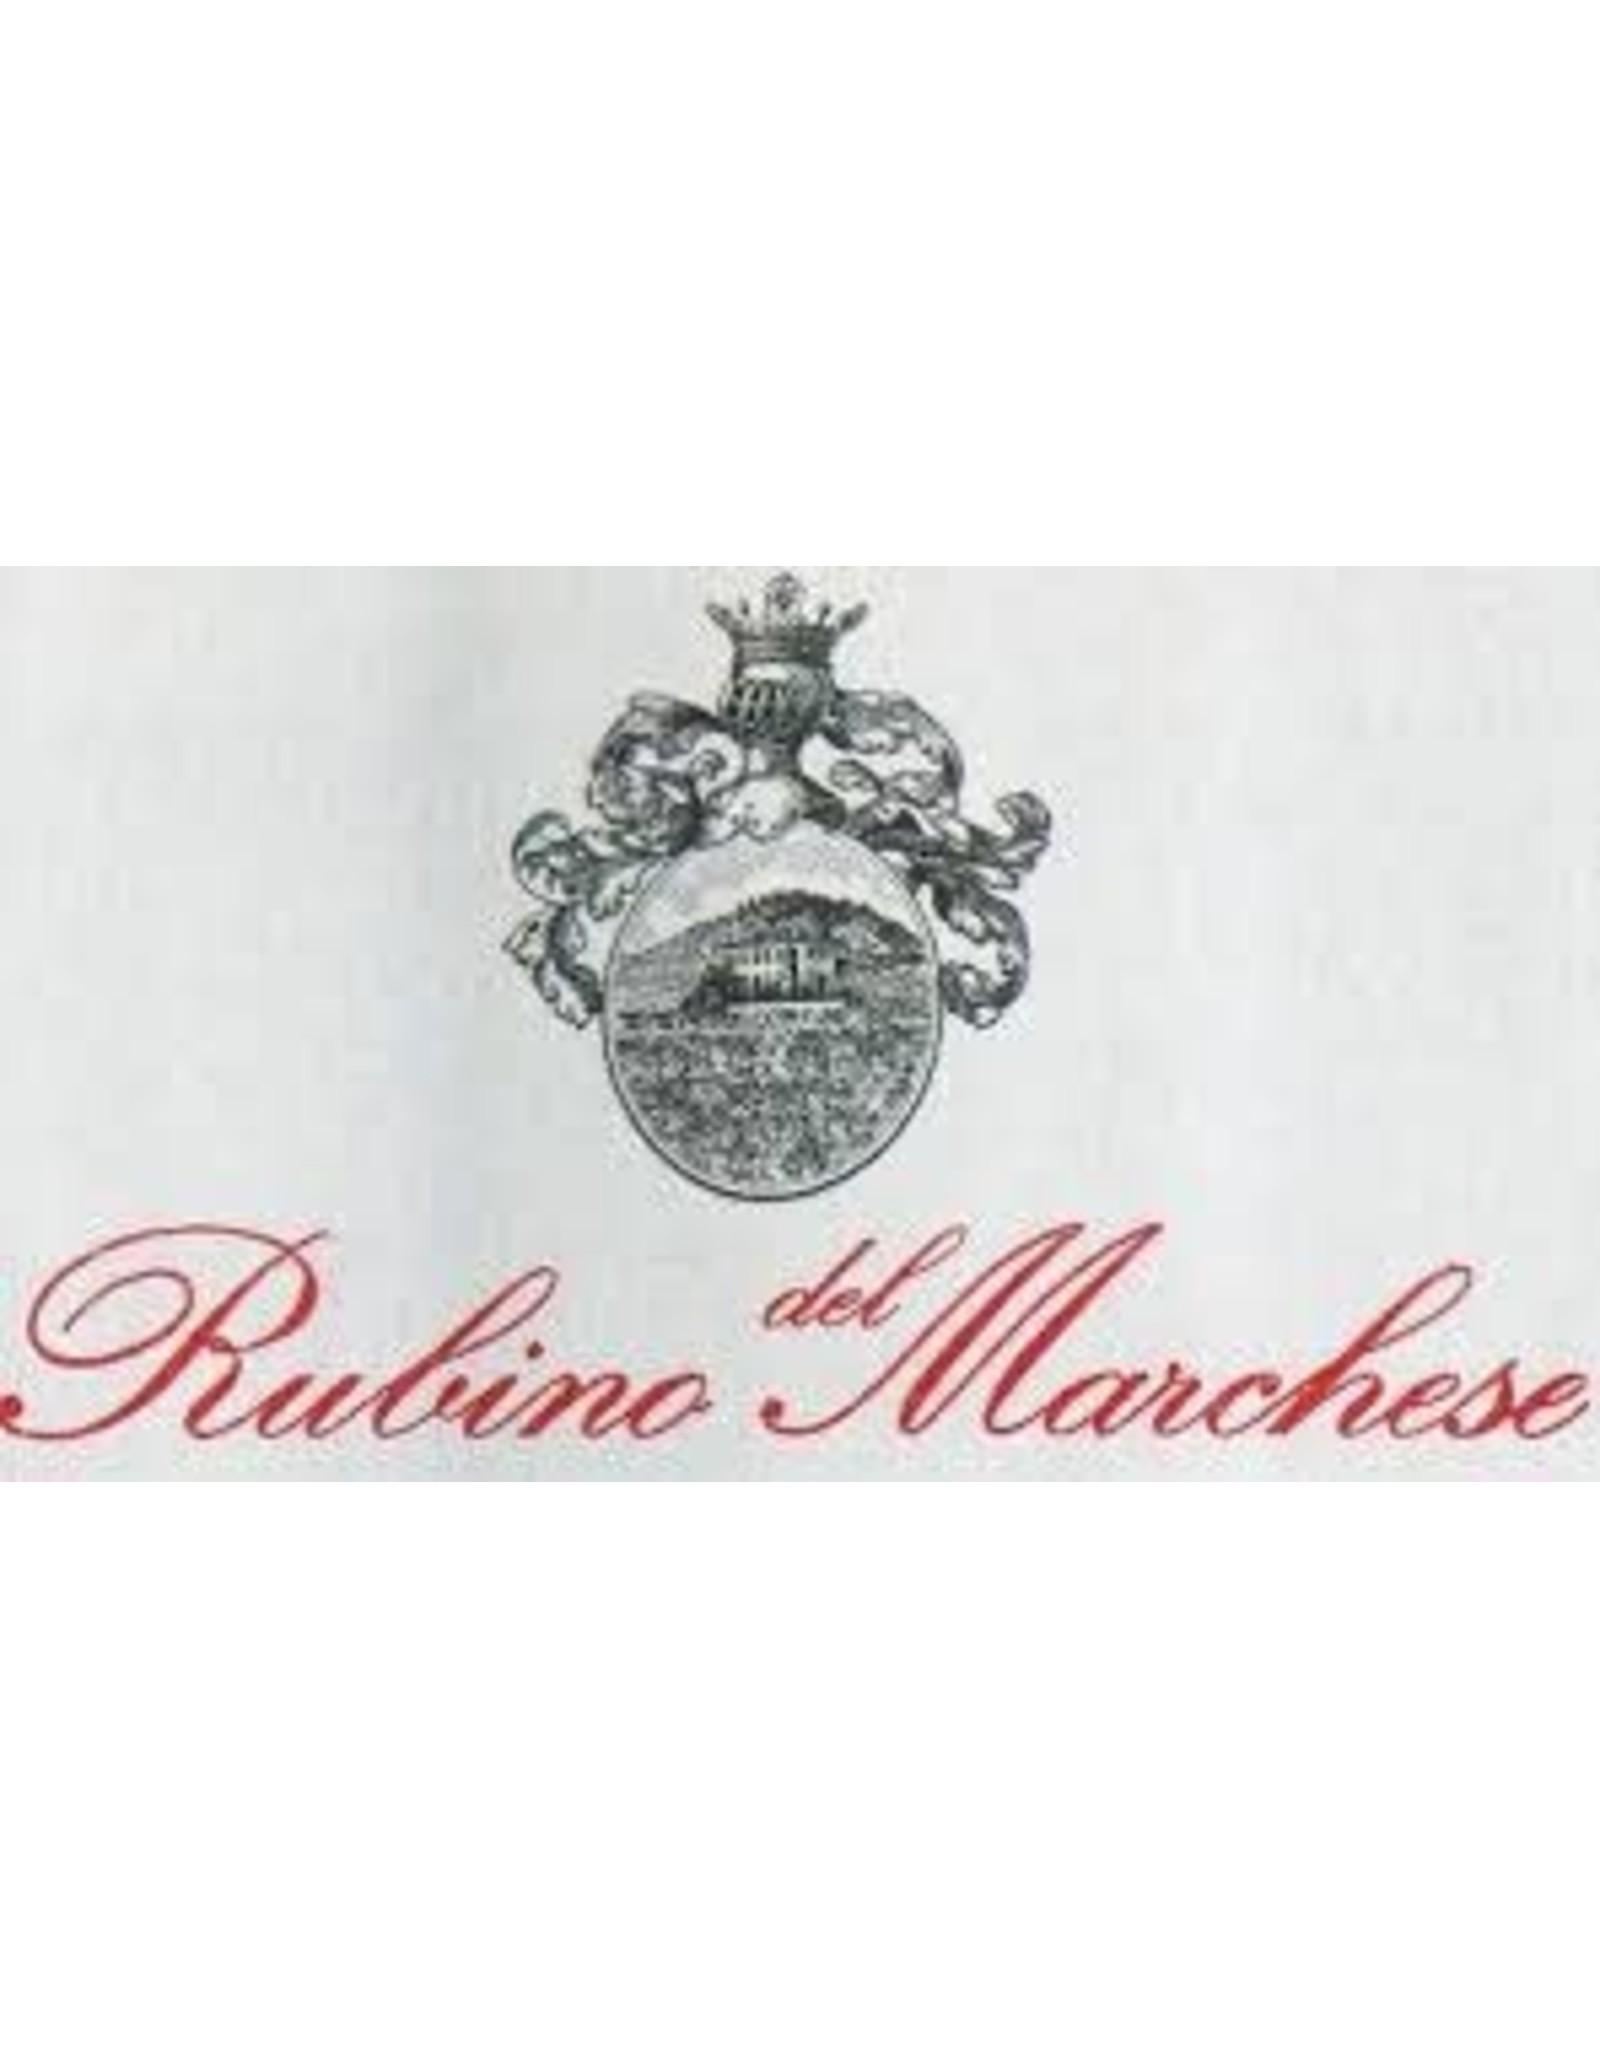 RUBINO DEL MARCHESE TOSCANA RED 2016